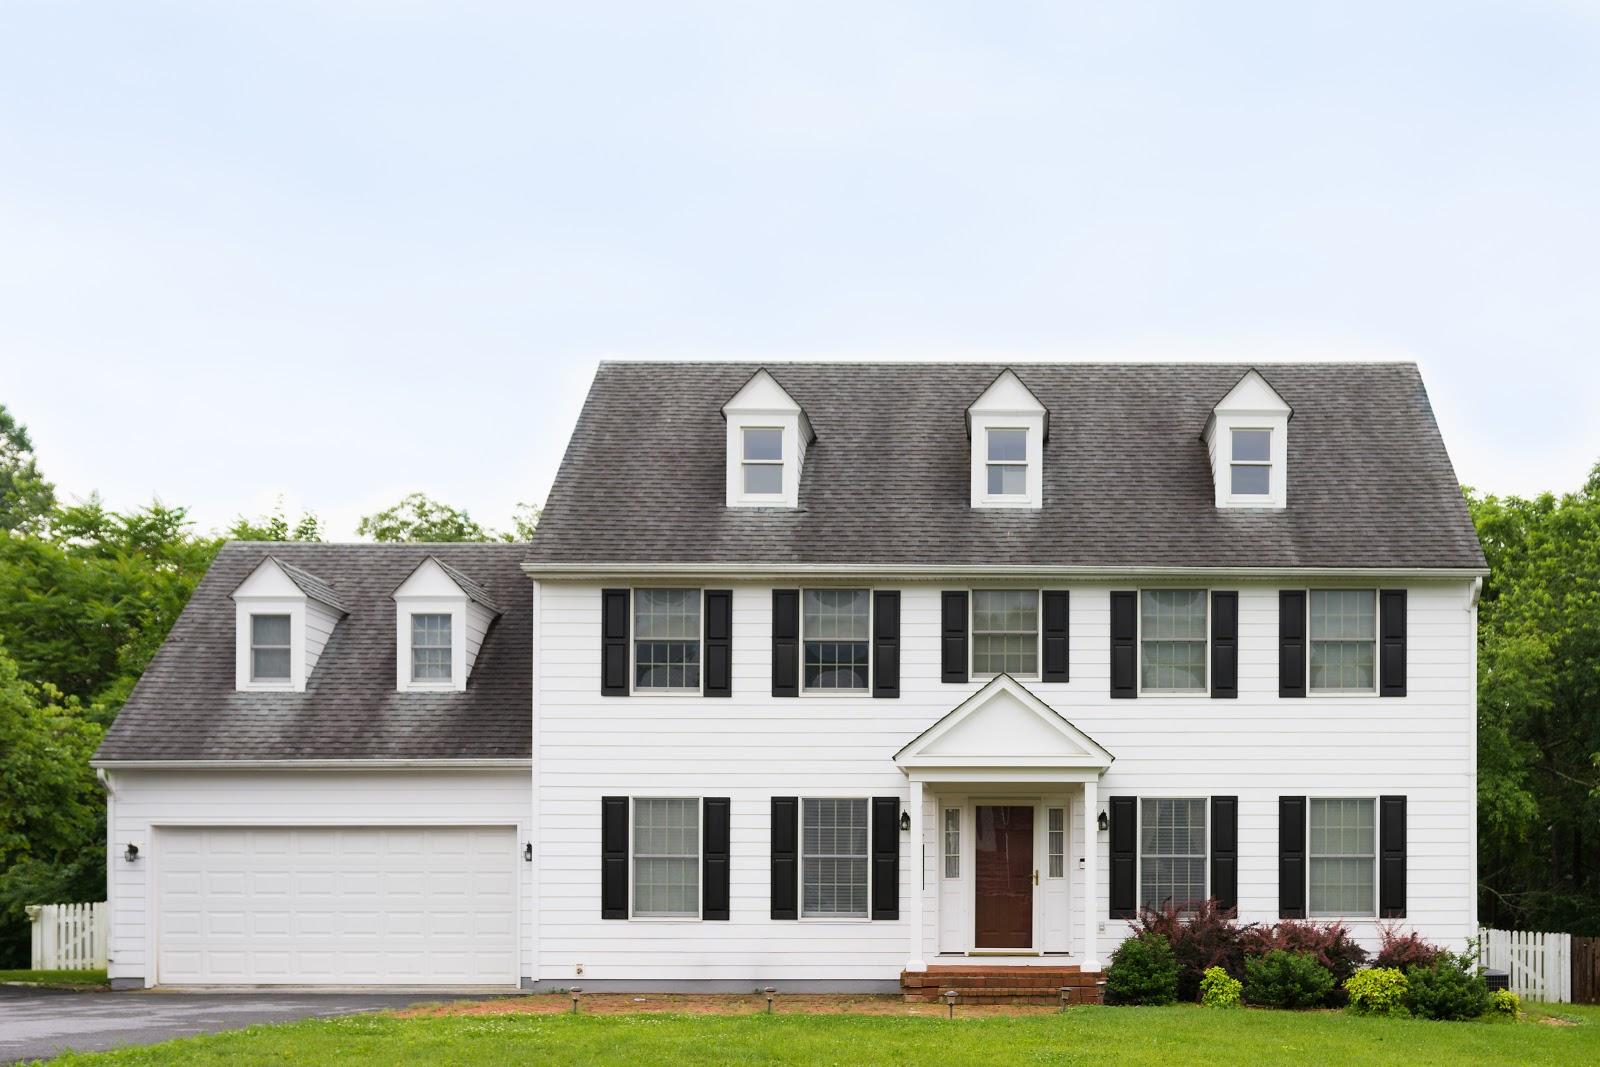 Henrico Virginia Real Estate trends